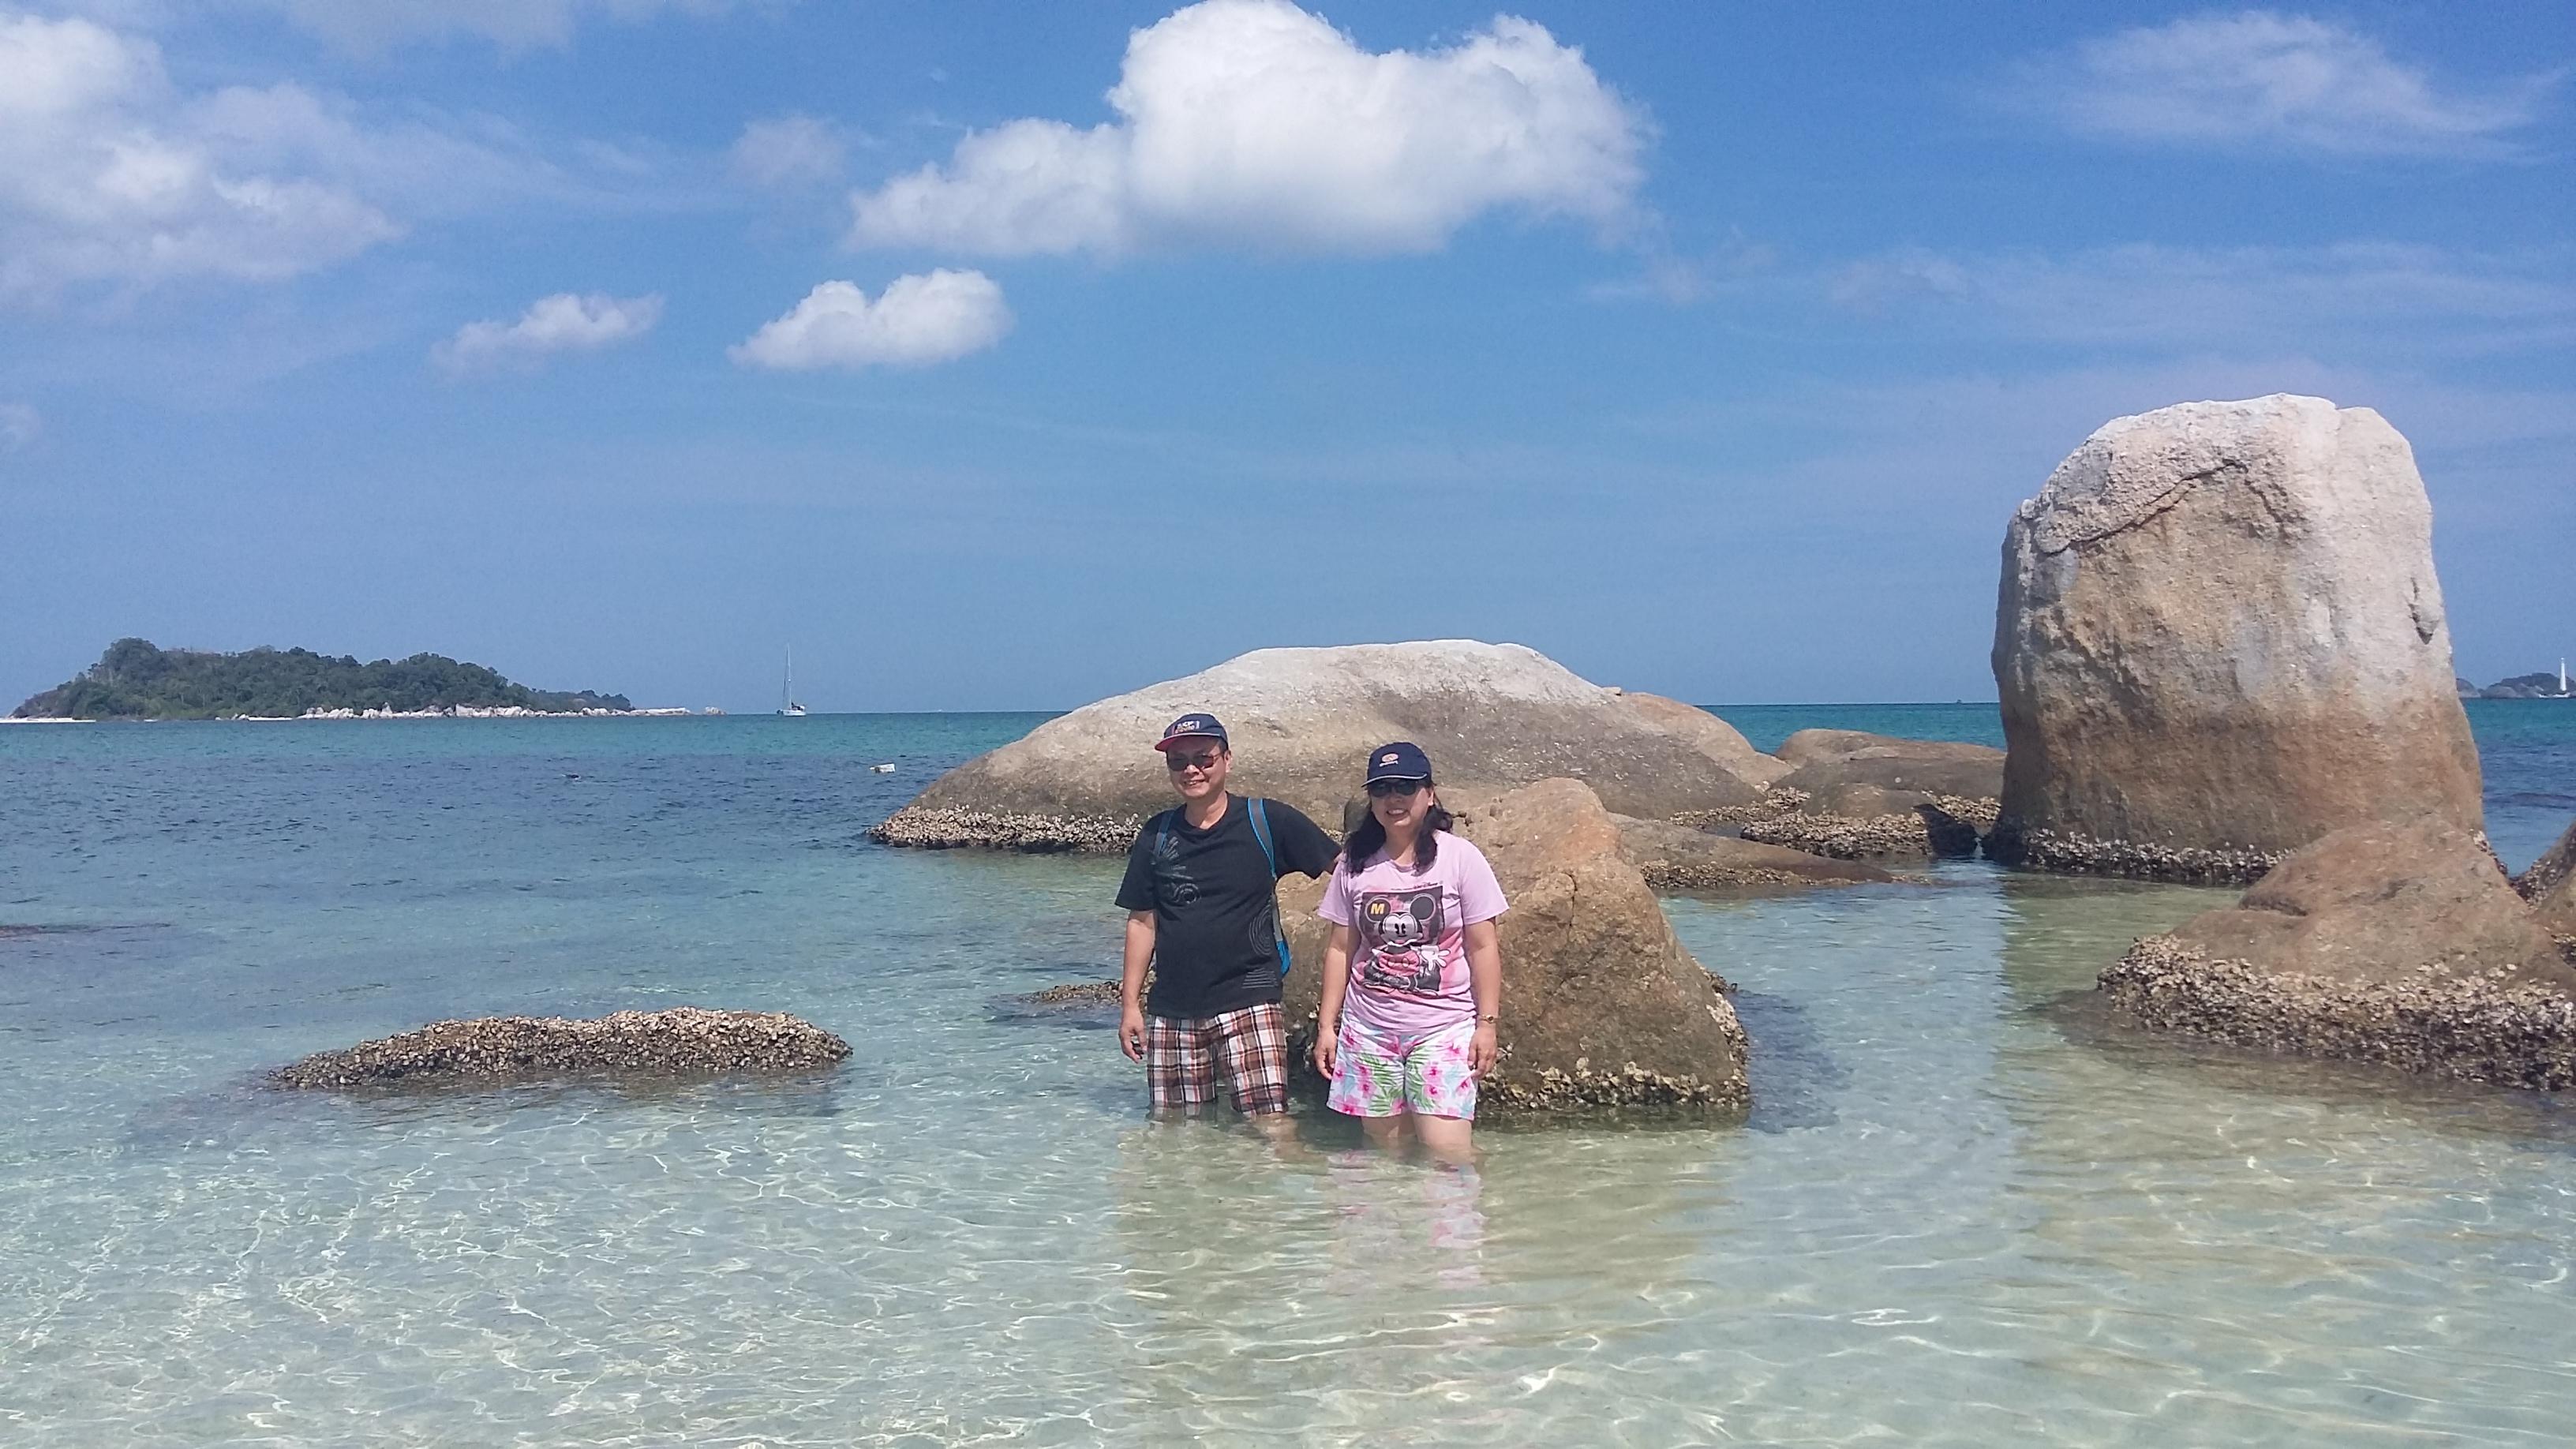 Pantai Pesisir Sijuk – Lokasi Wisata Ngehits Belitung